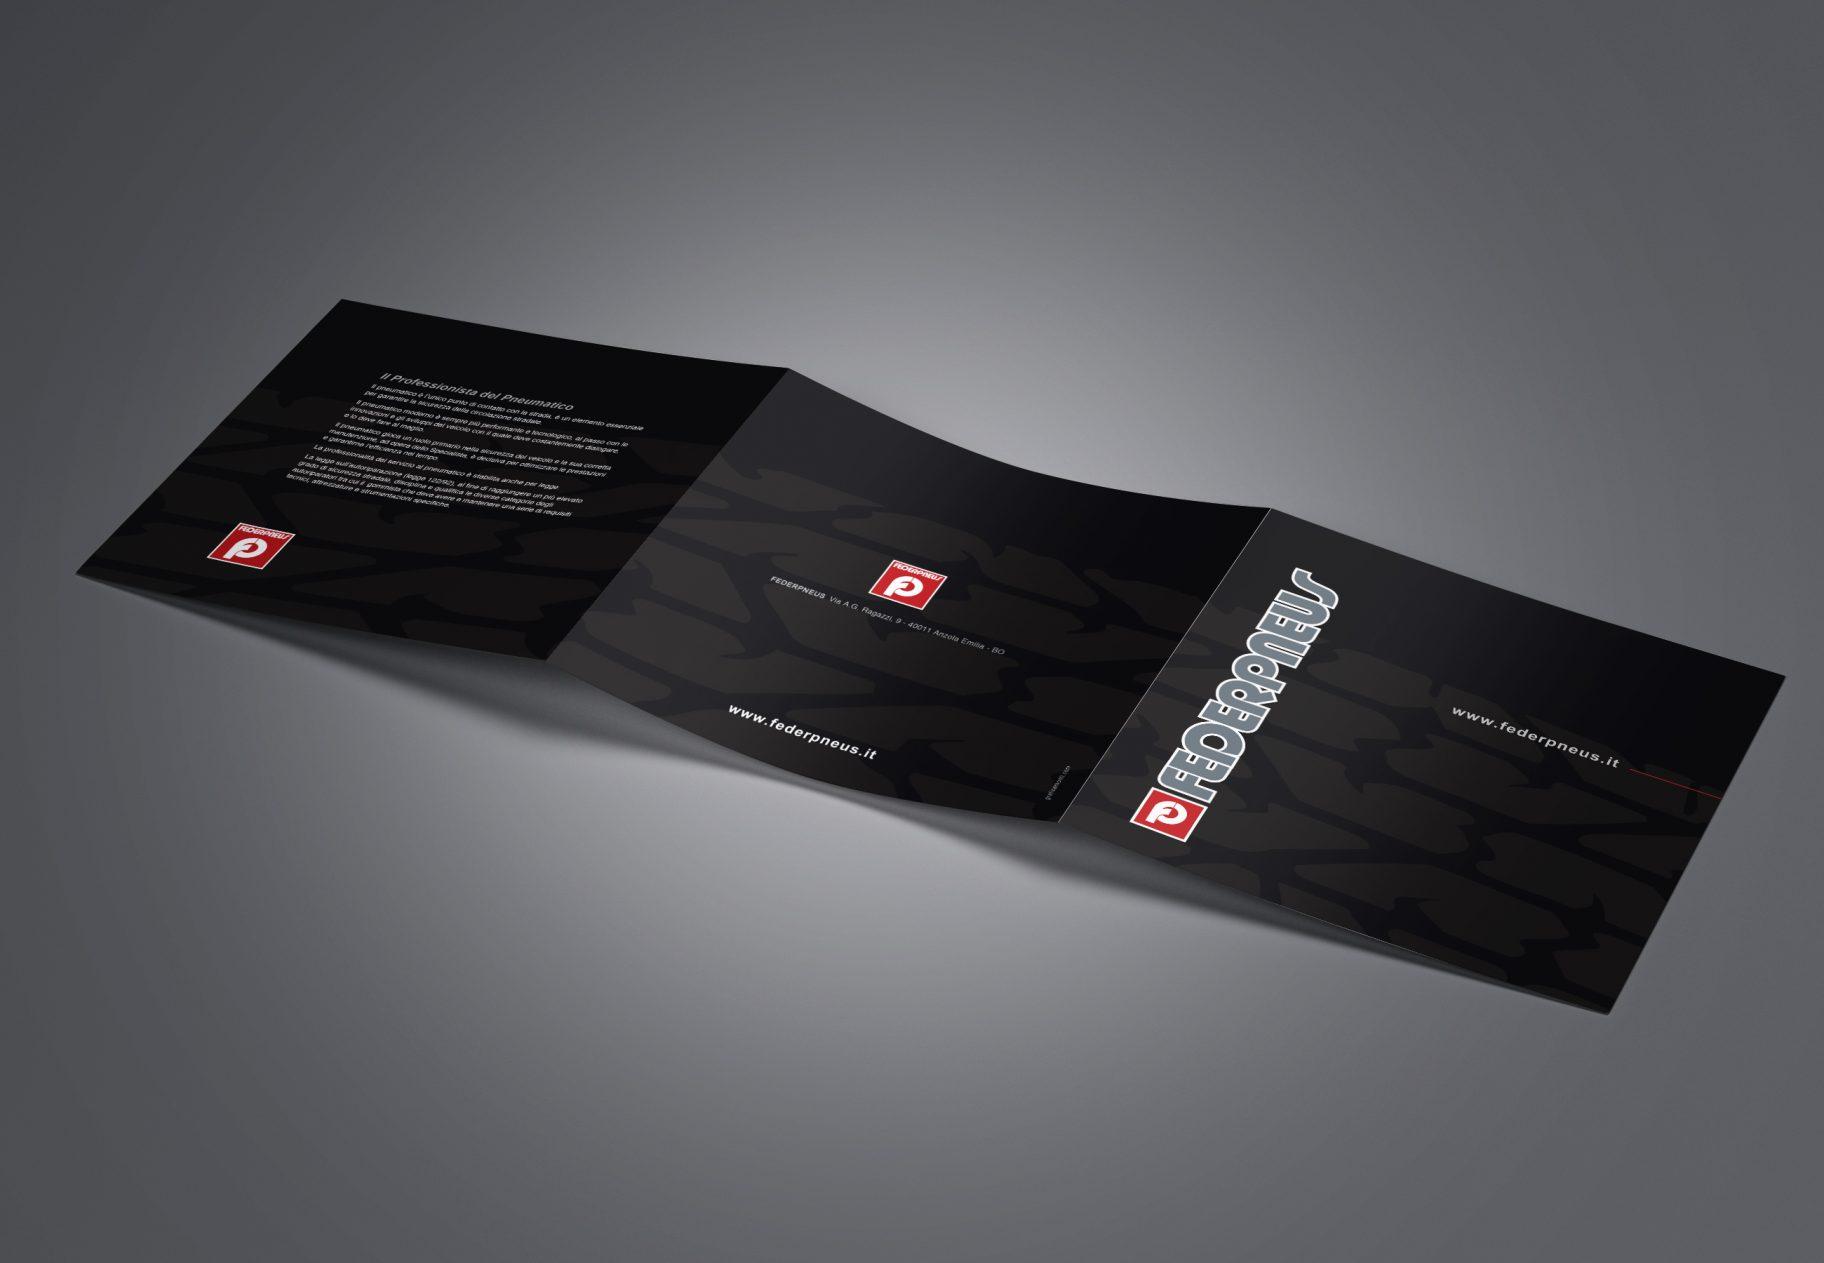 Federpneus-Brochure-Pieghevole-copertina-esterno